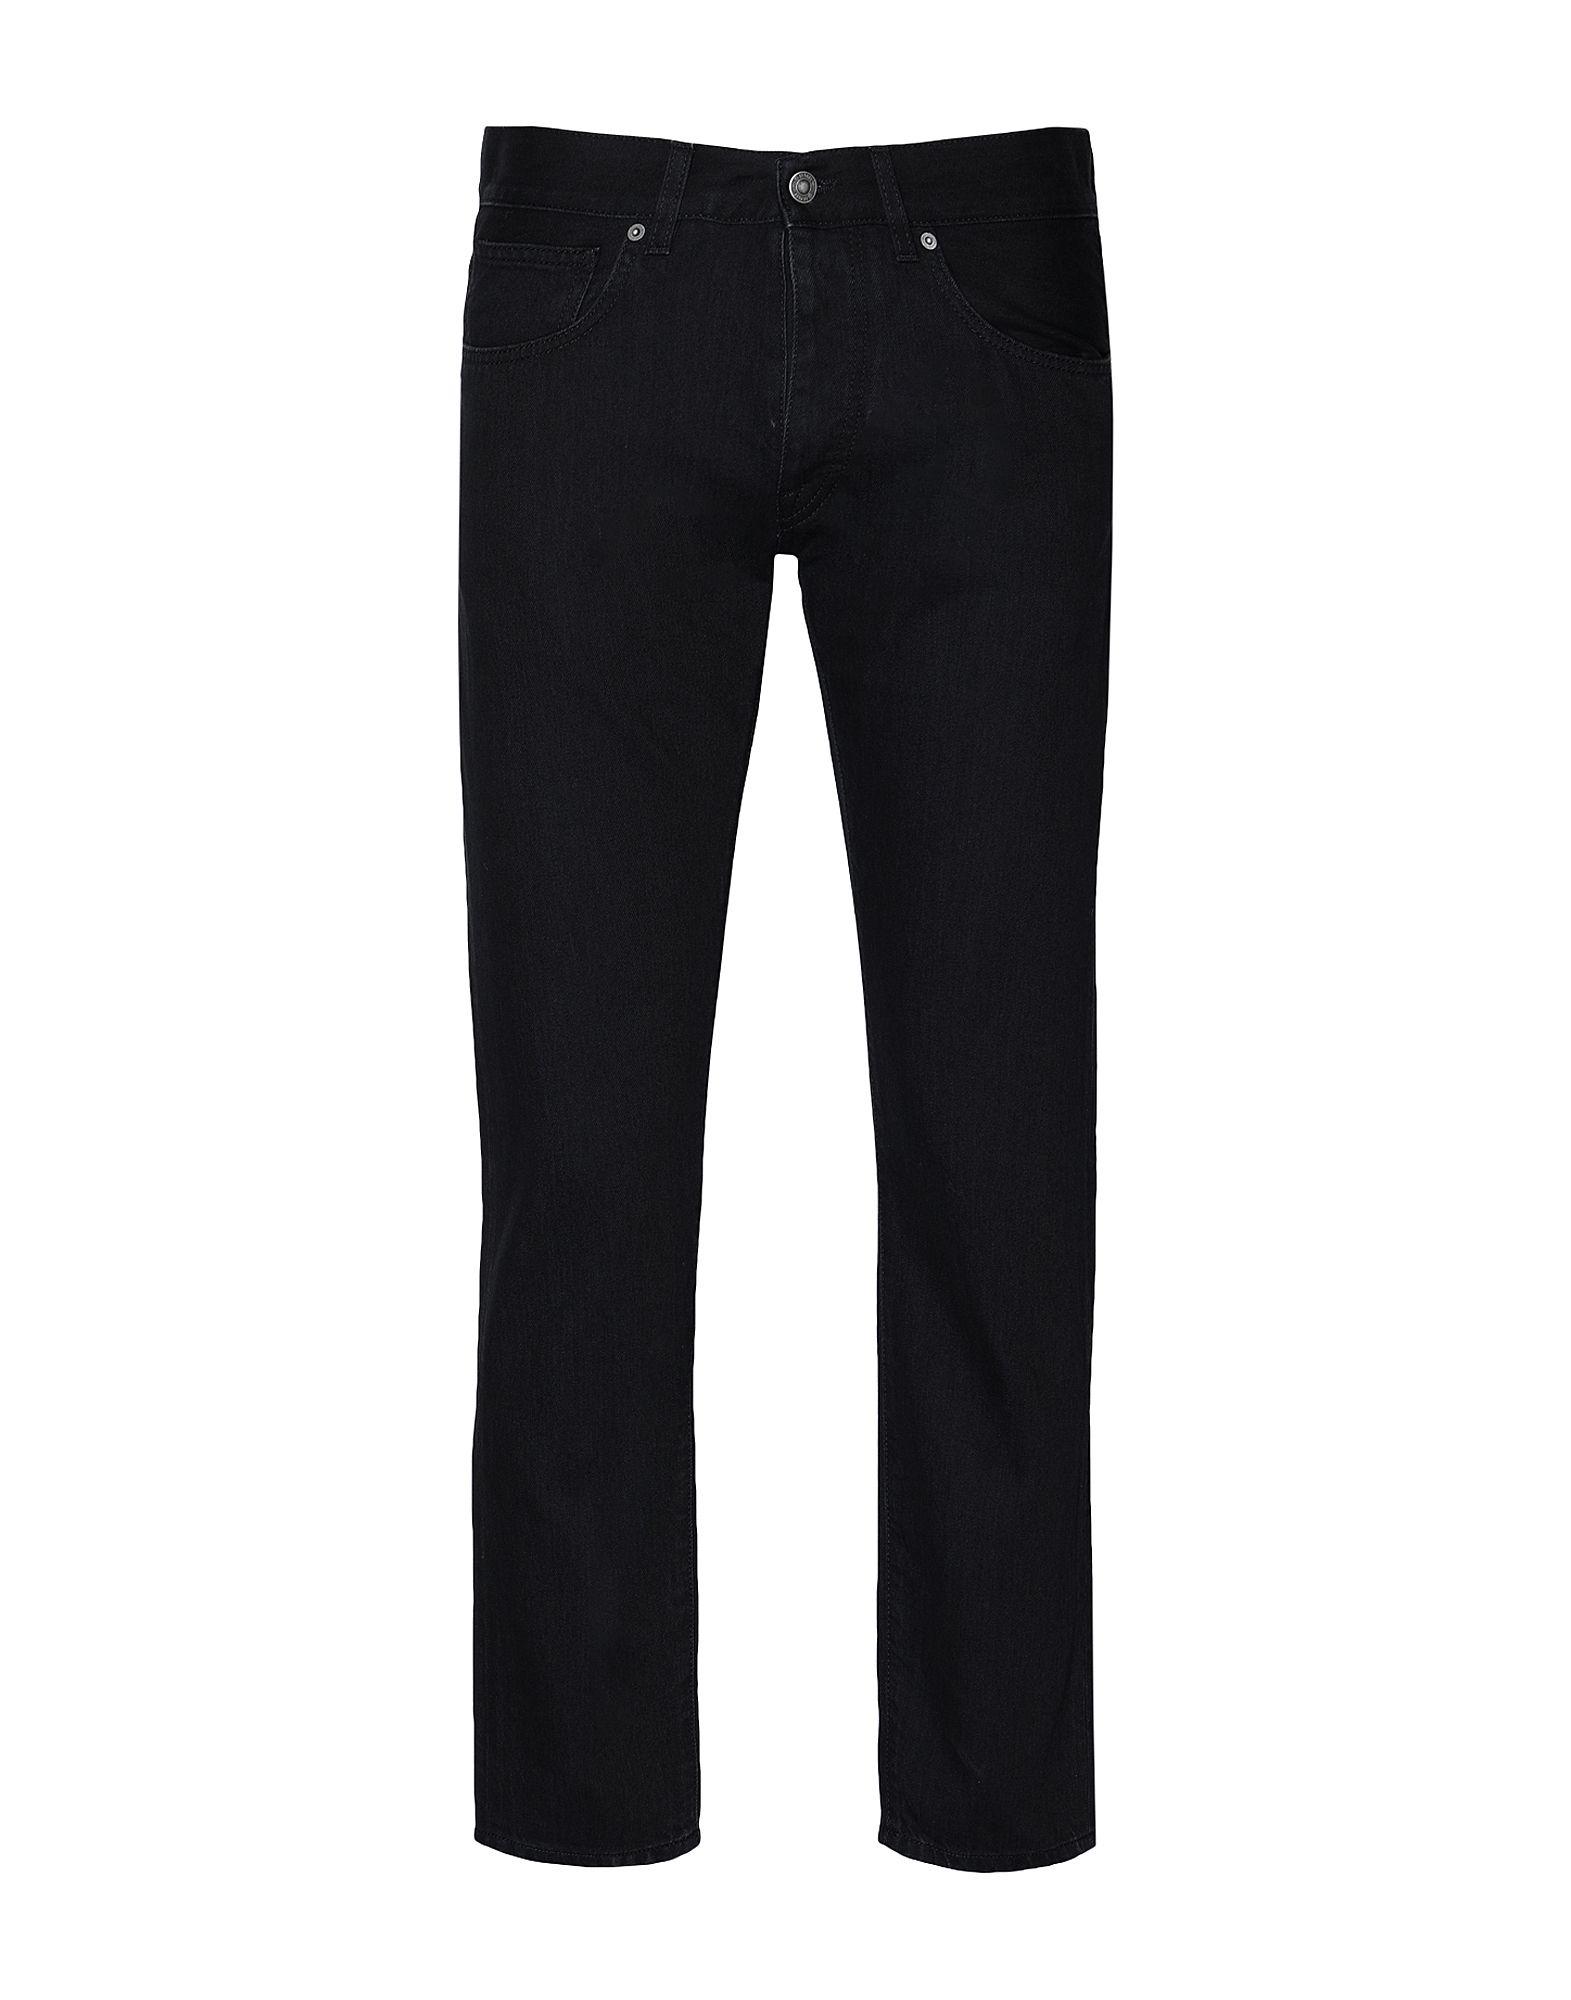 8 by YOOX Denim pants - Item 42759954